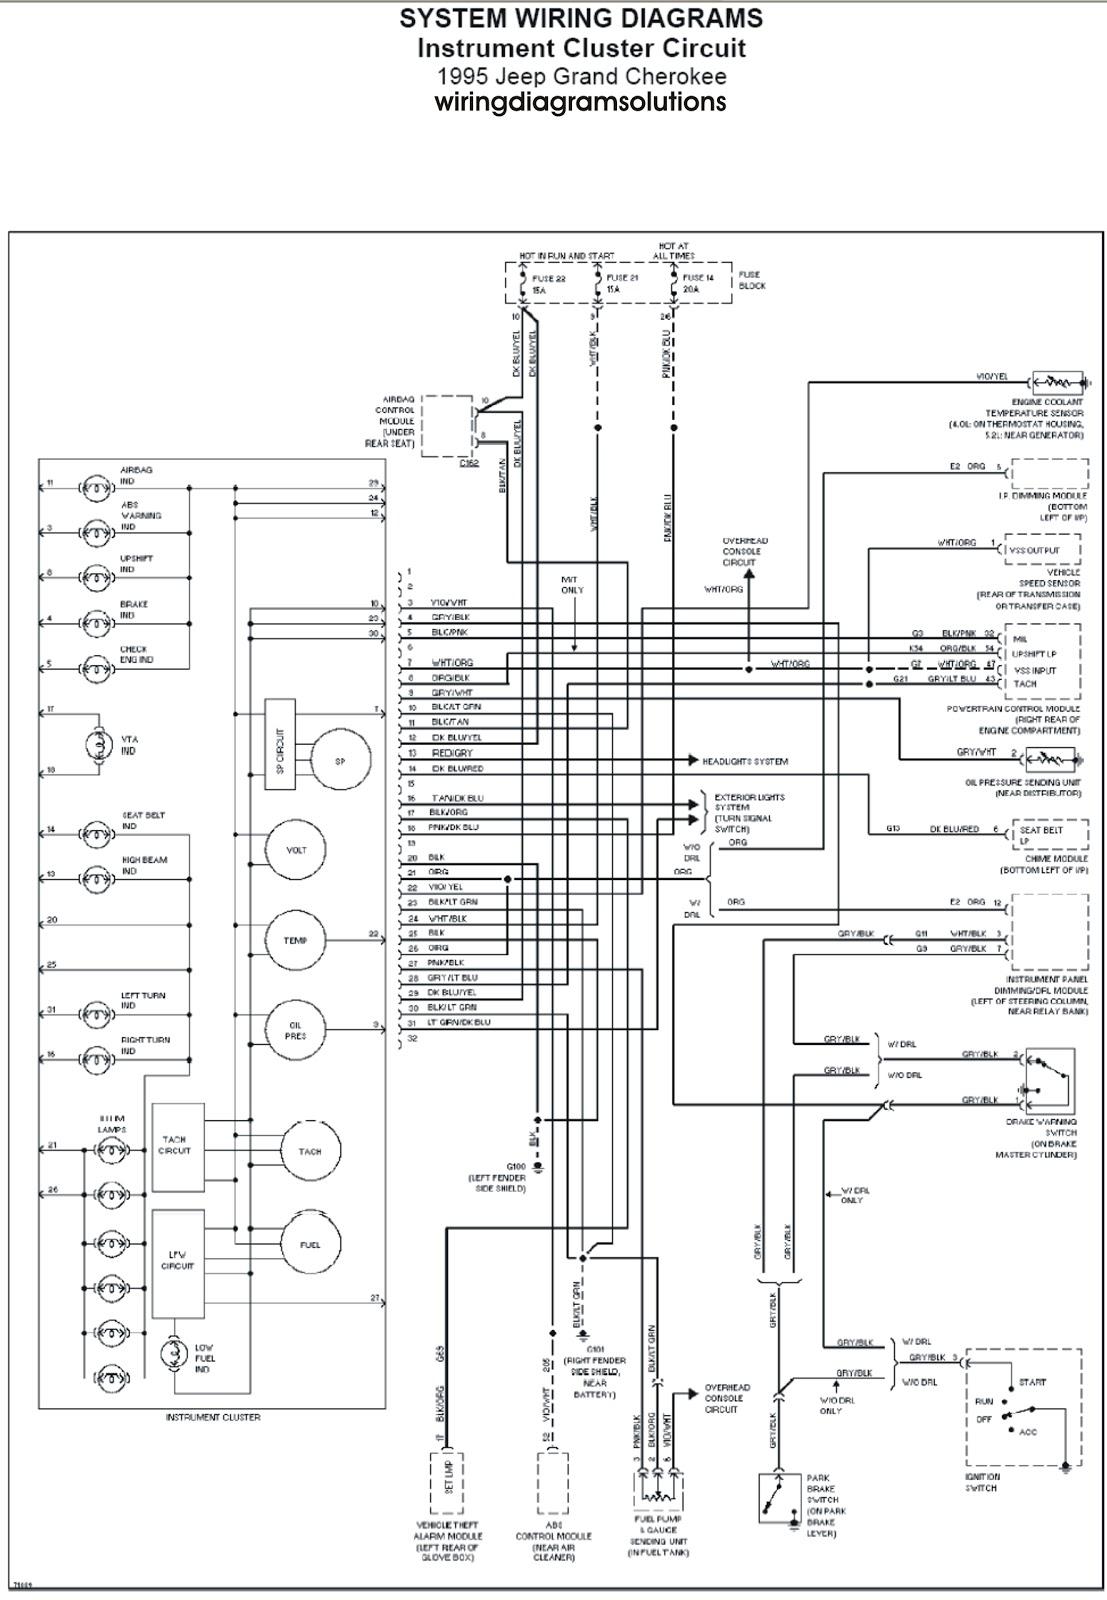 2000 jeep grand cherokee wiring harness - wiring diagram system self-norm-a  - self-norm-a.ediliadesign.it  ediliadesign.it